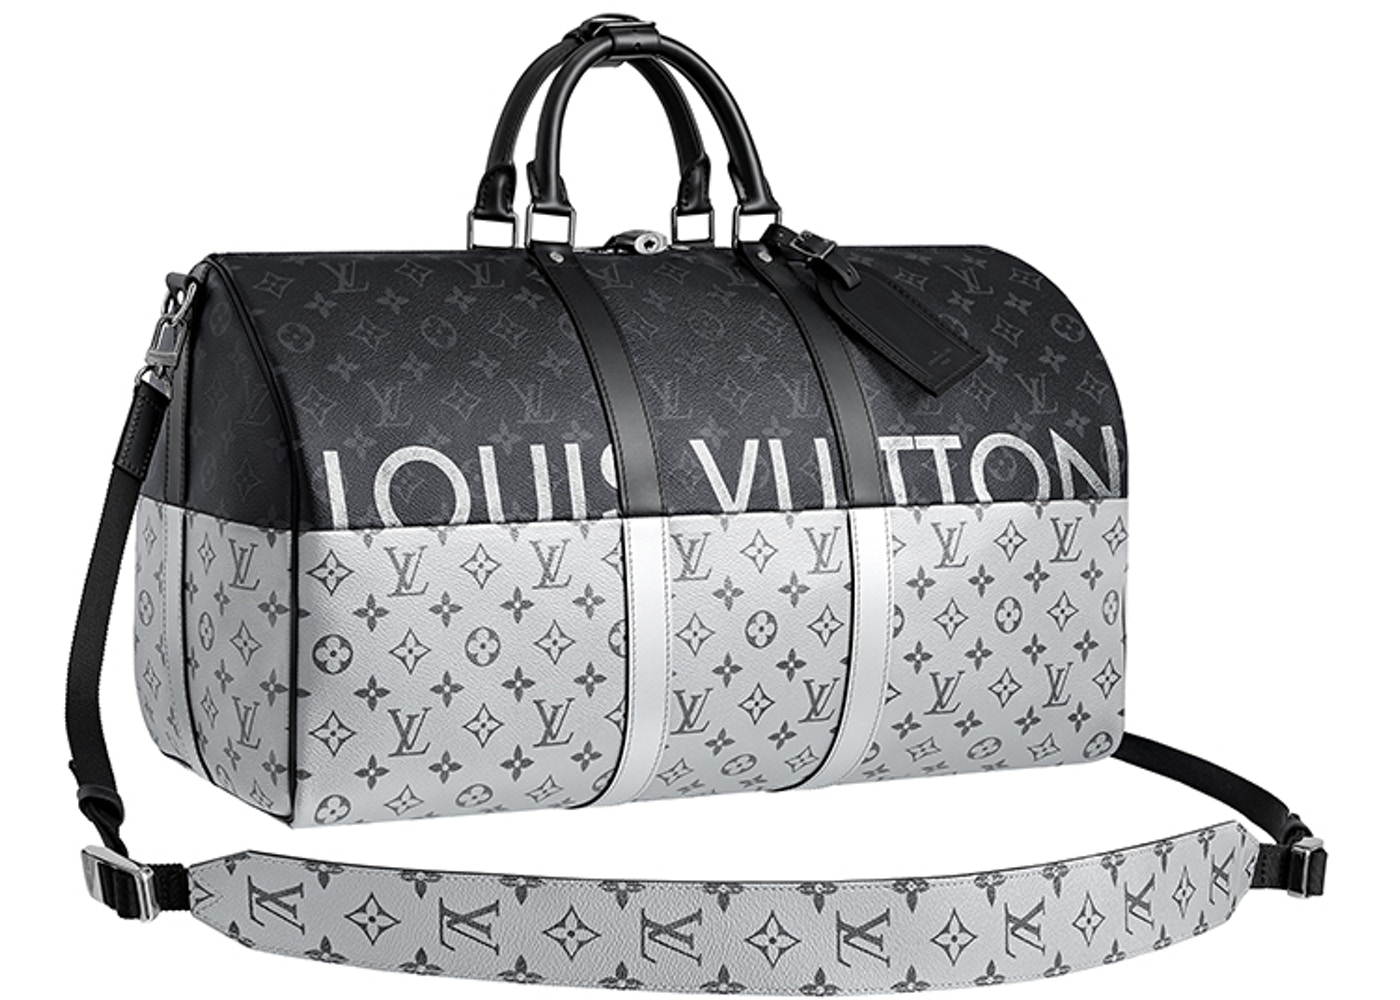 8fd212b5cc3 Louis Vuitton Keepall Bandouliere Monogram Eclipse Outdoor Split 50  Black/Silver